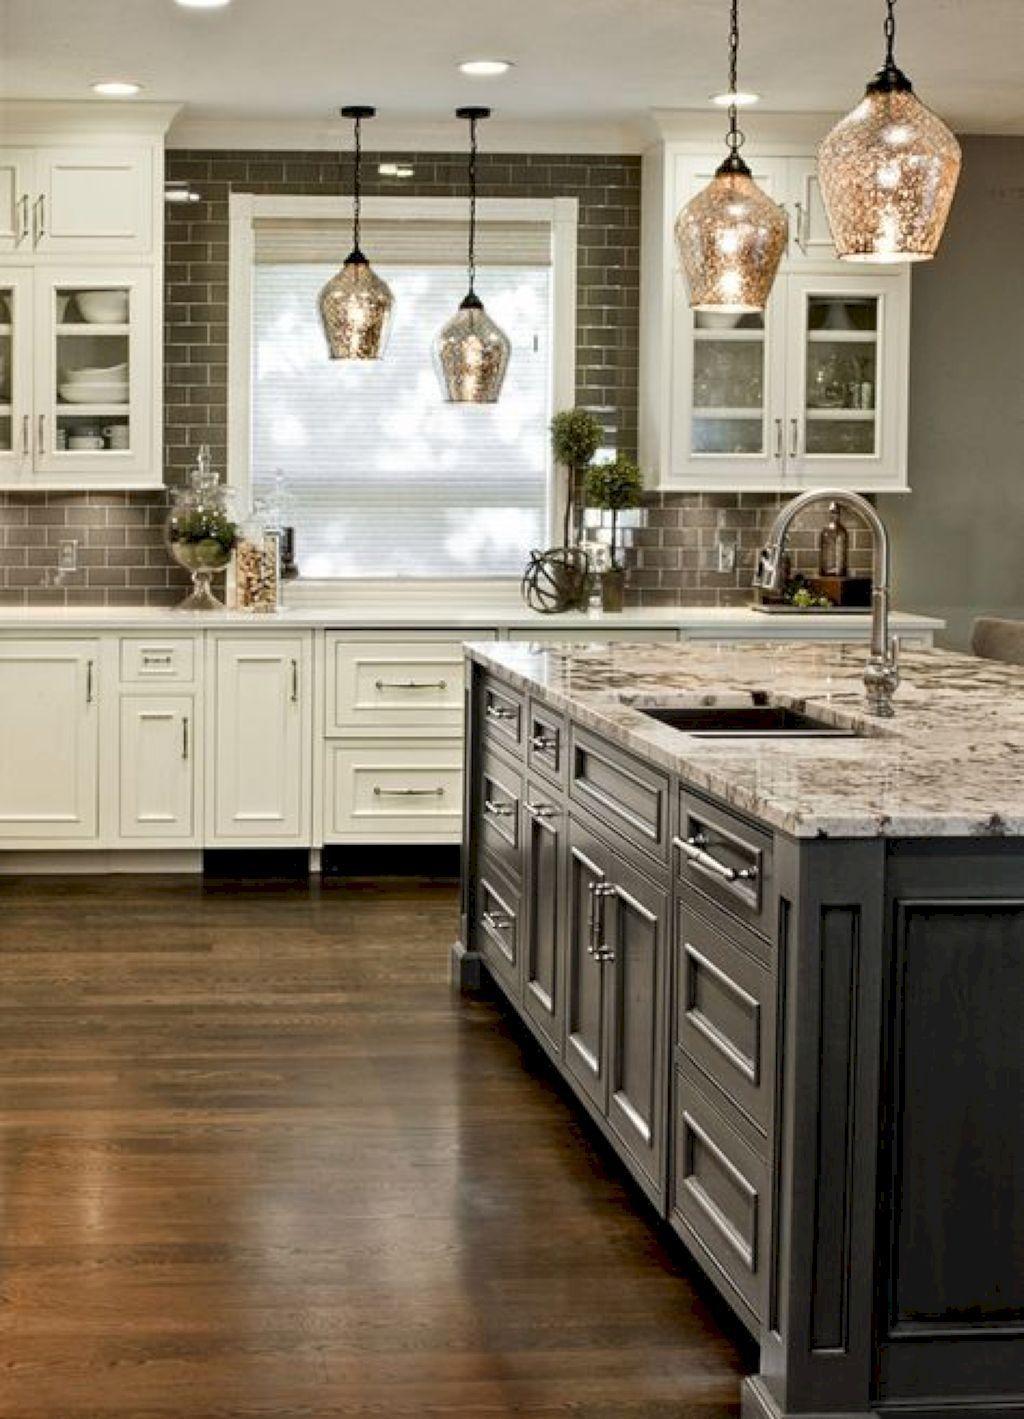 36 Fantastic Kitchen Backsplash Ideas  Backsplash Ideas Kitchen Beauteous Kitchen Designs Modern Review